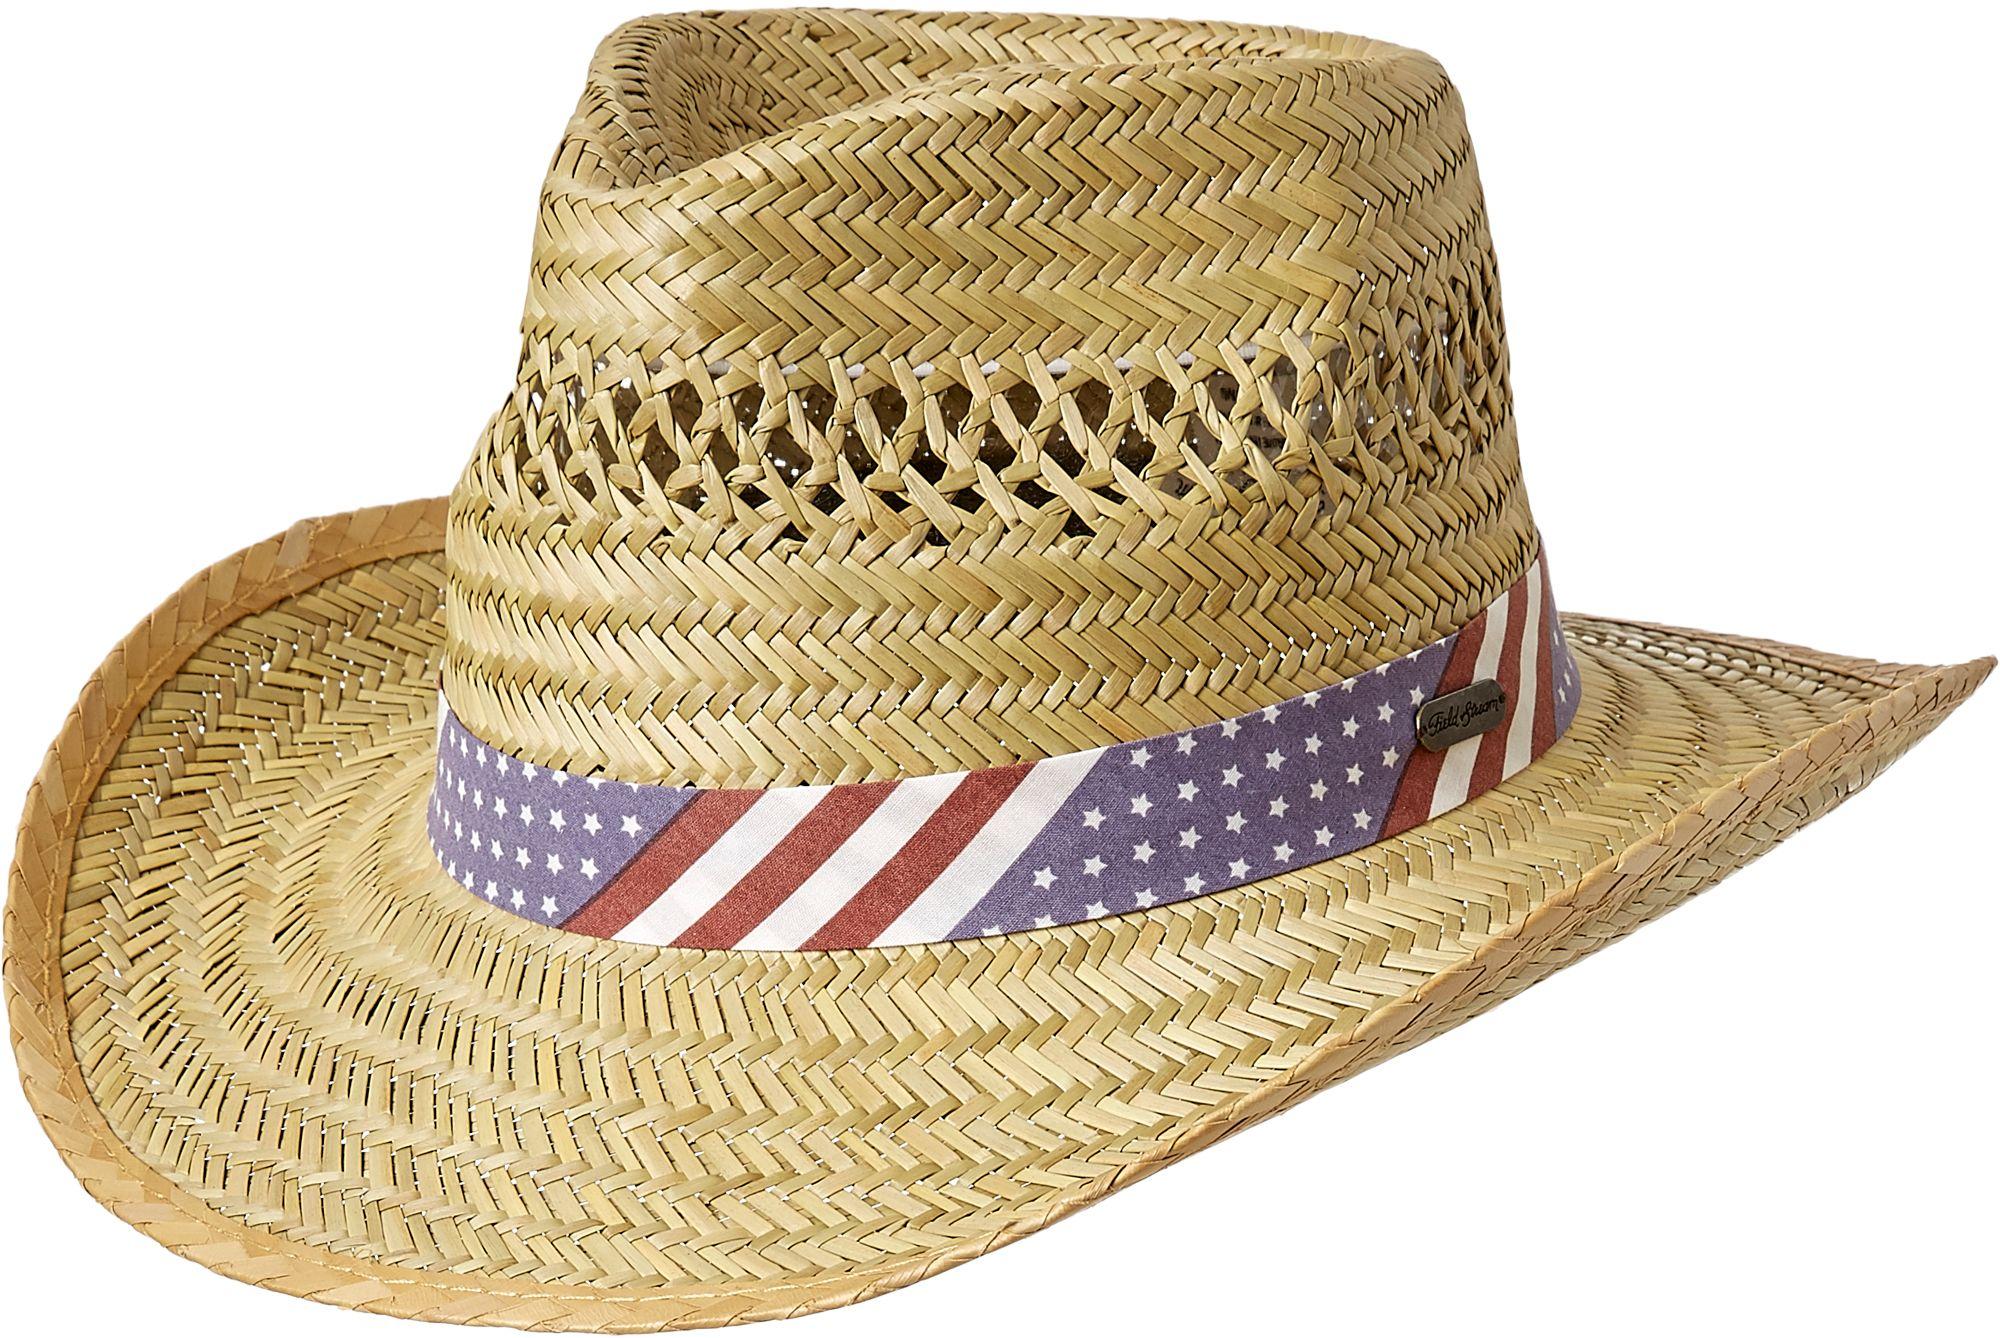 ecc9ee84a40153 Field & Stream Men's Americana Straw Hat | DICK'S Sporting ...